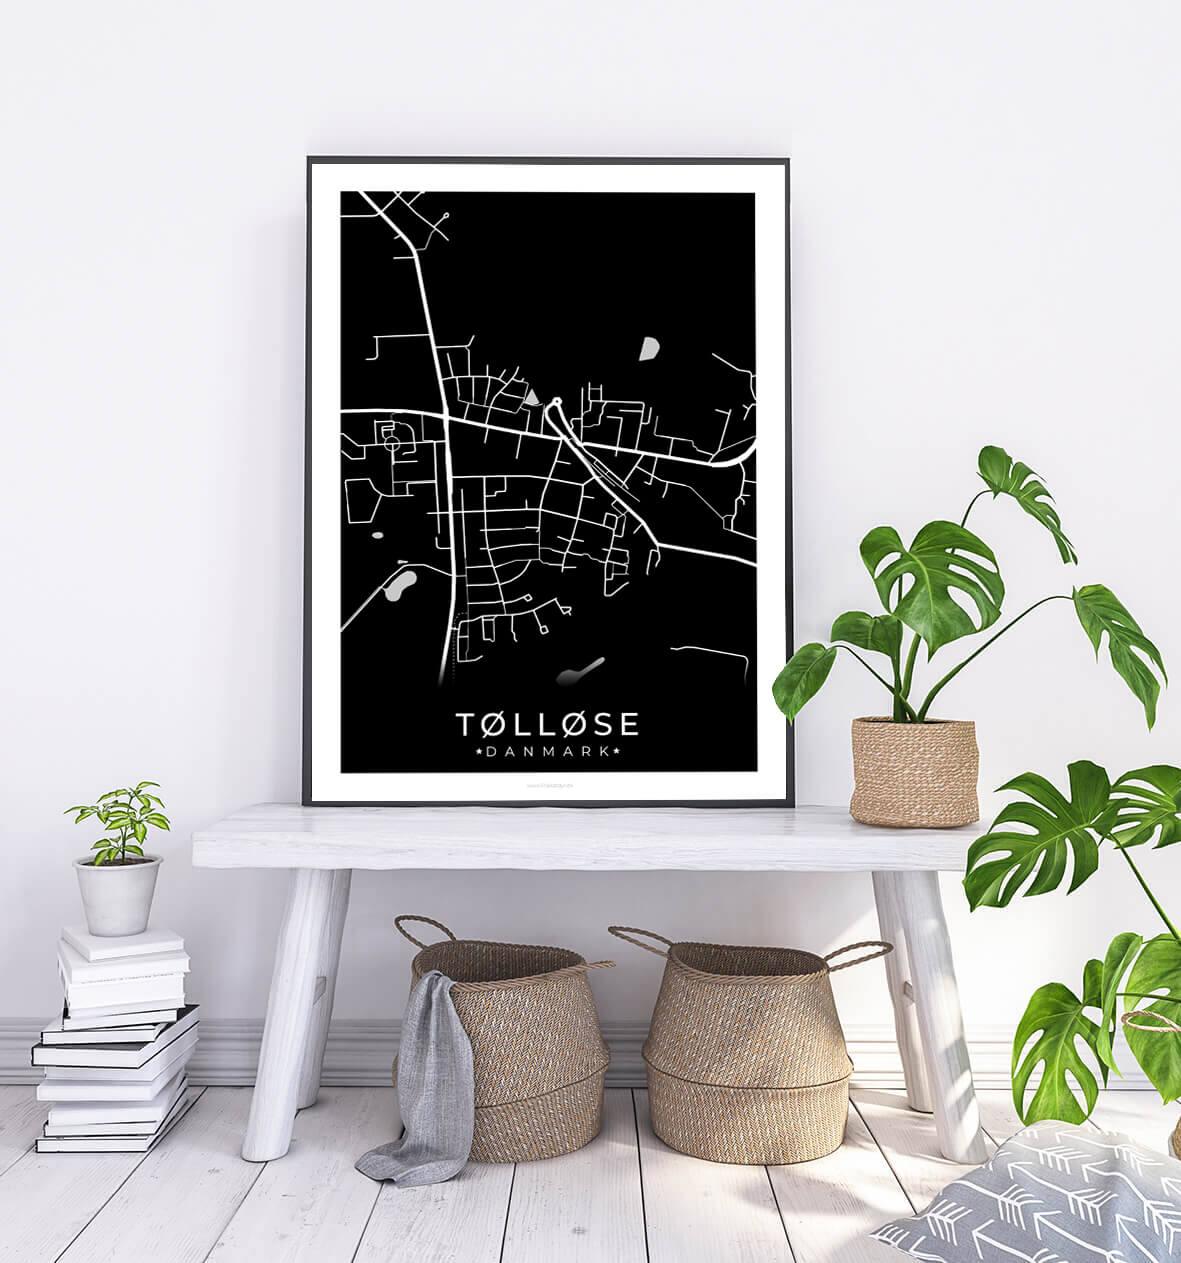 Toelloese-plakat-sort-3